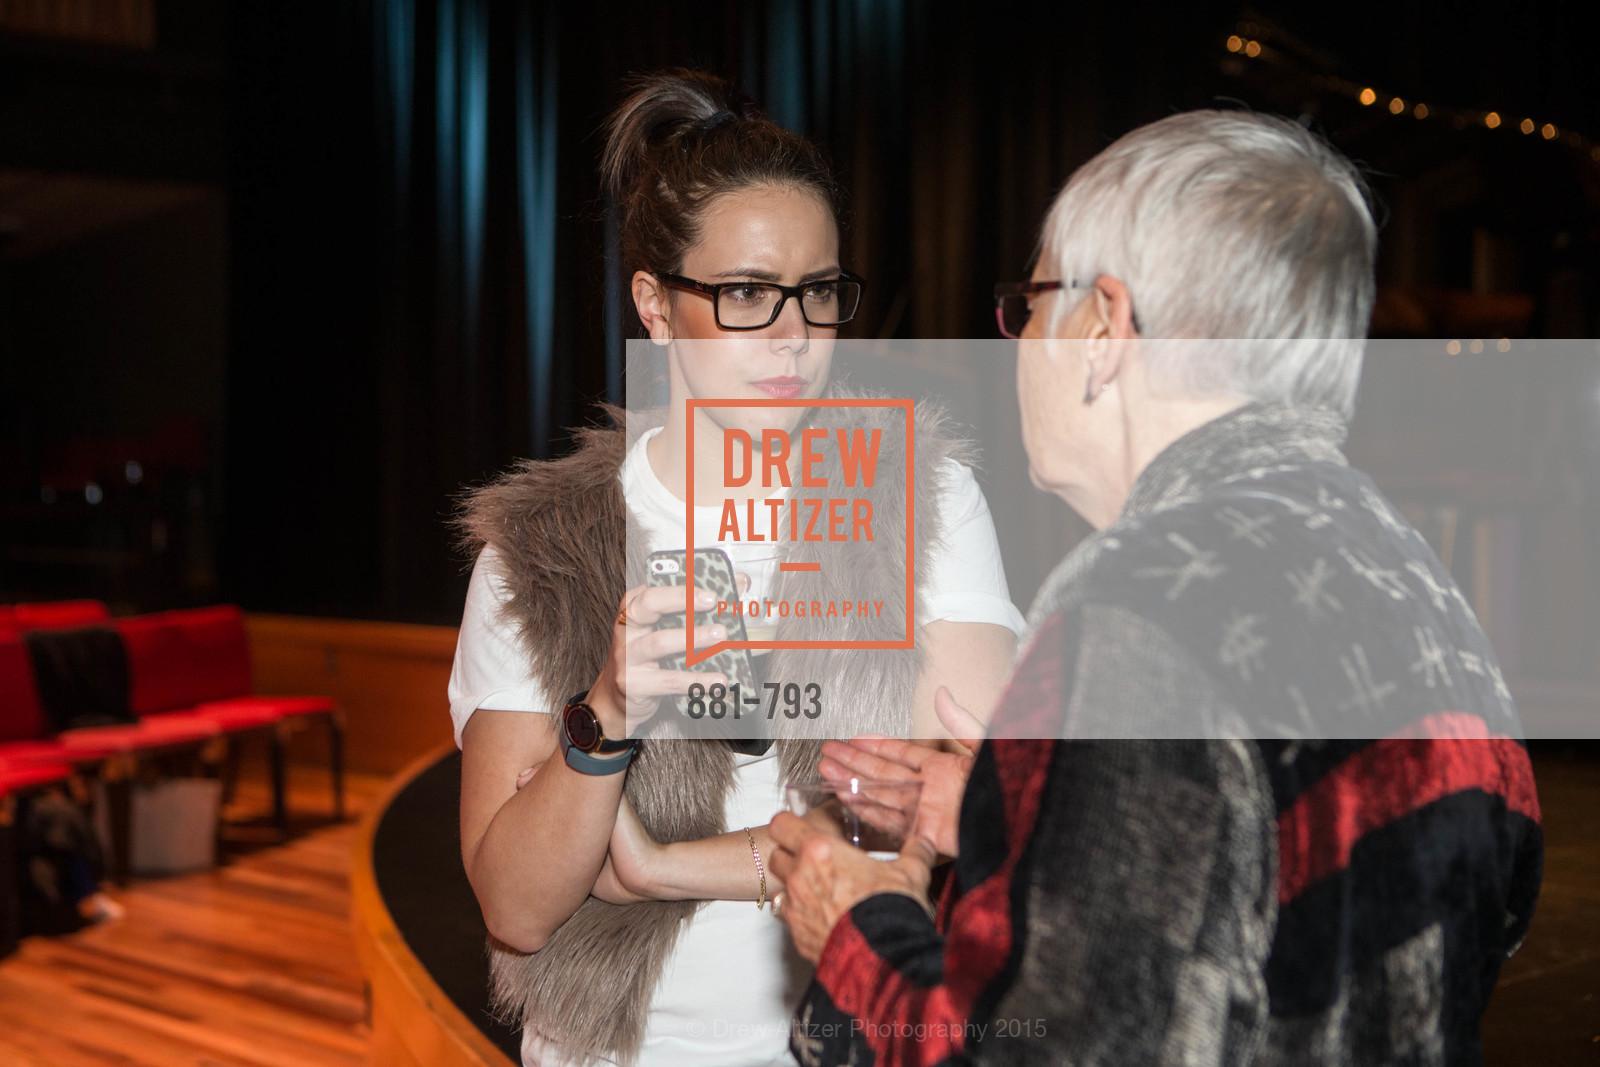 Extras, SF BRAVO CLUB Sneak Peek at the EXPLORATORIUM, April 22nd, 2015, Photo,Drew Altizer, Drew Altizer Photography, full-service agency, private events, San Francisco photographer, photographer california